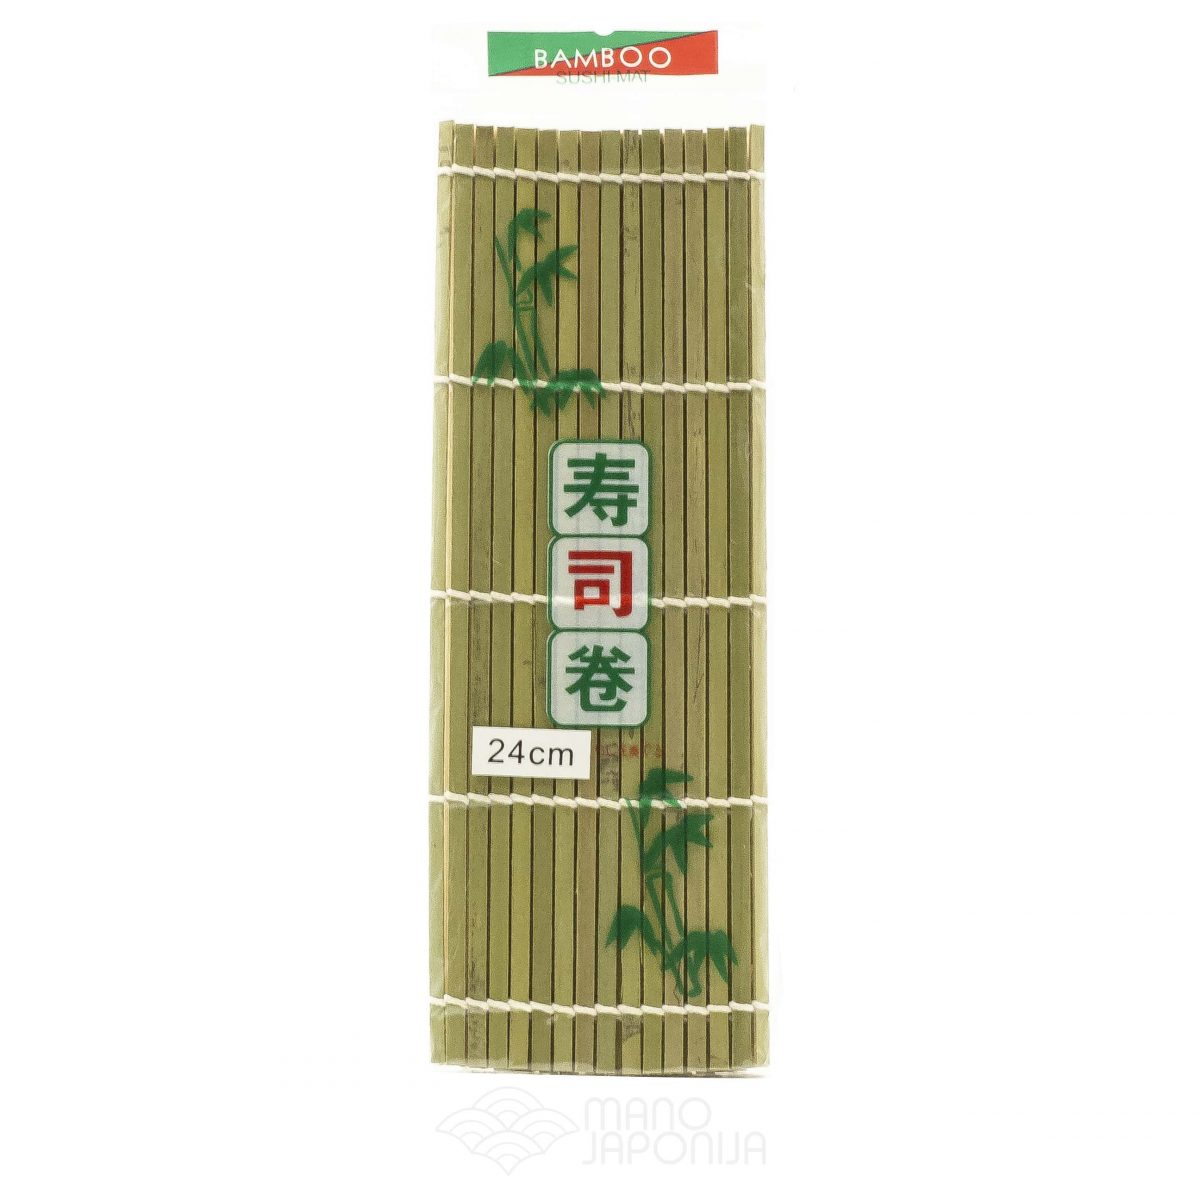 Bambukunis suši gaminimo kilimėlis 24cm